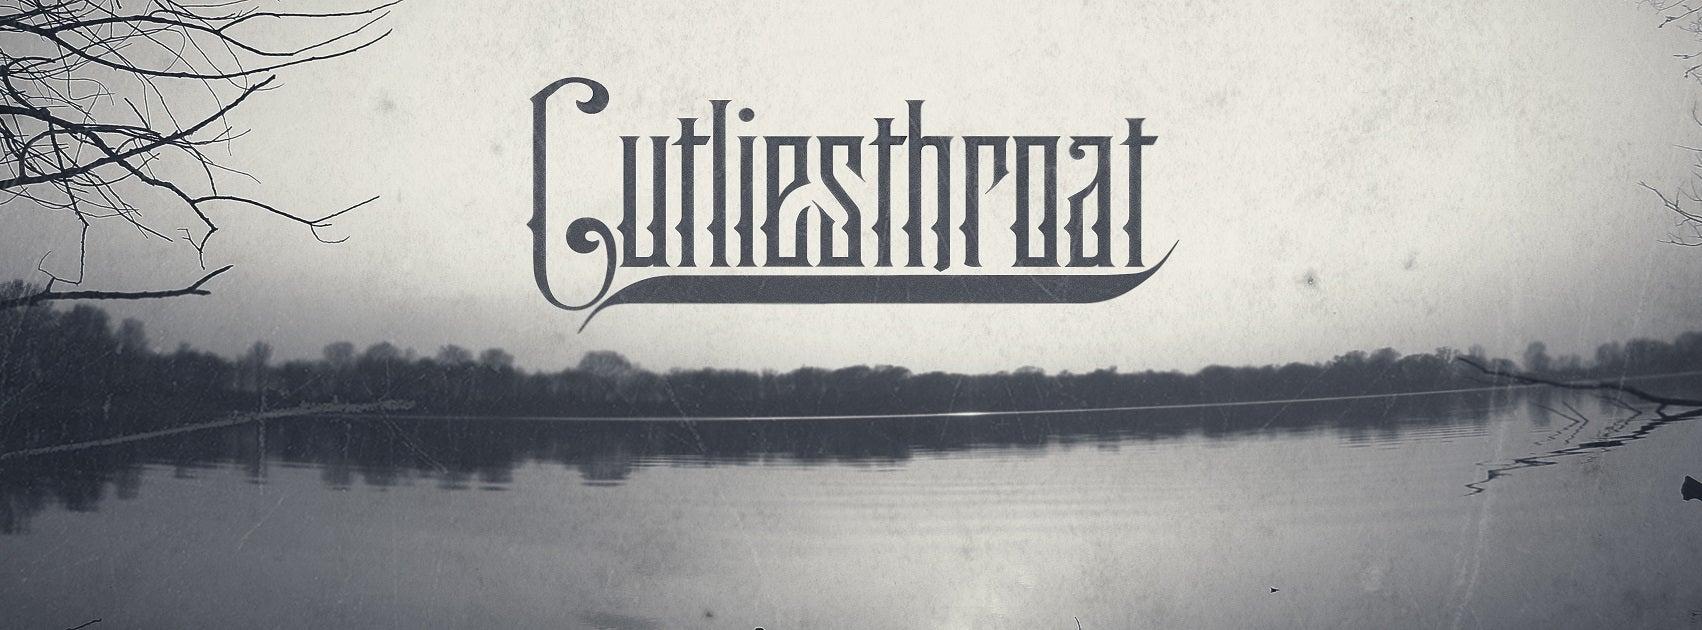 Cutliesthroat